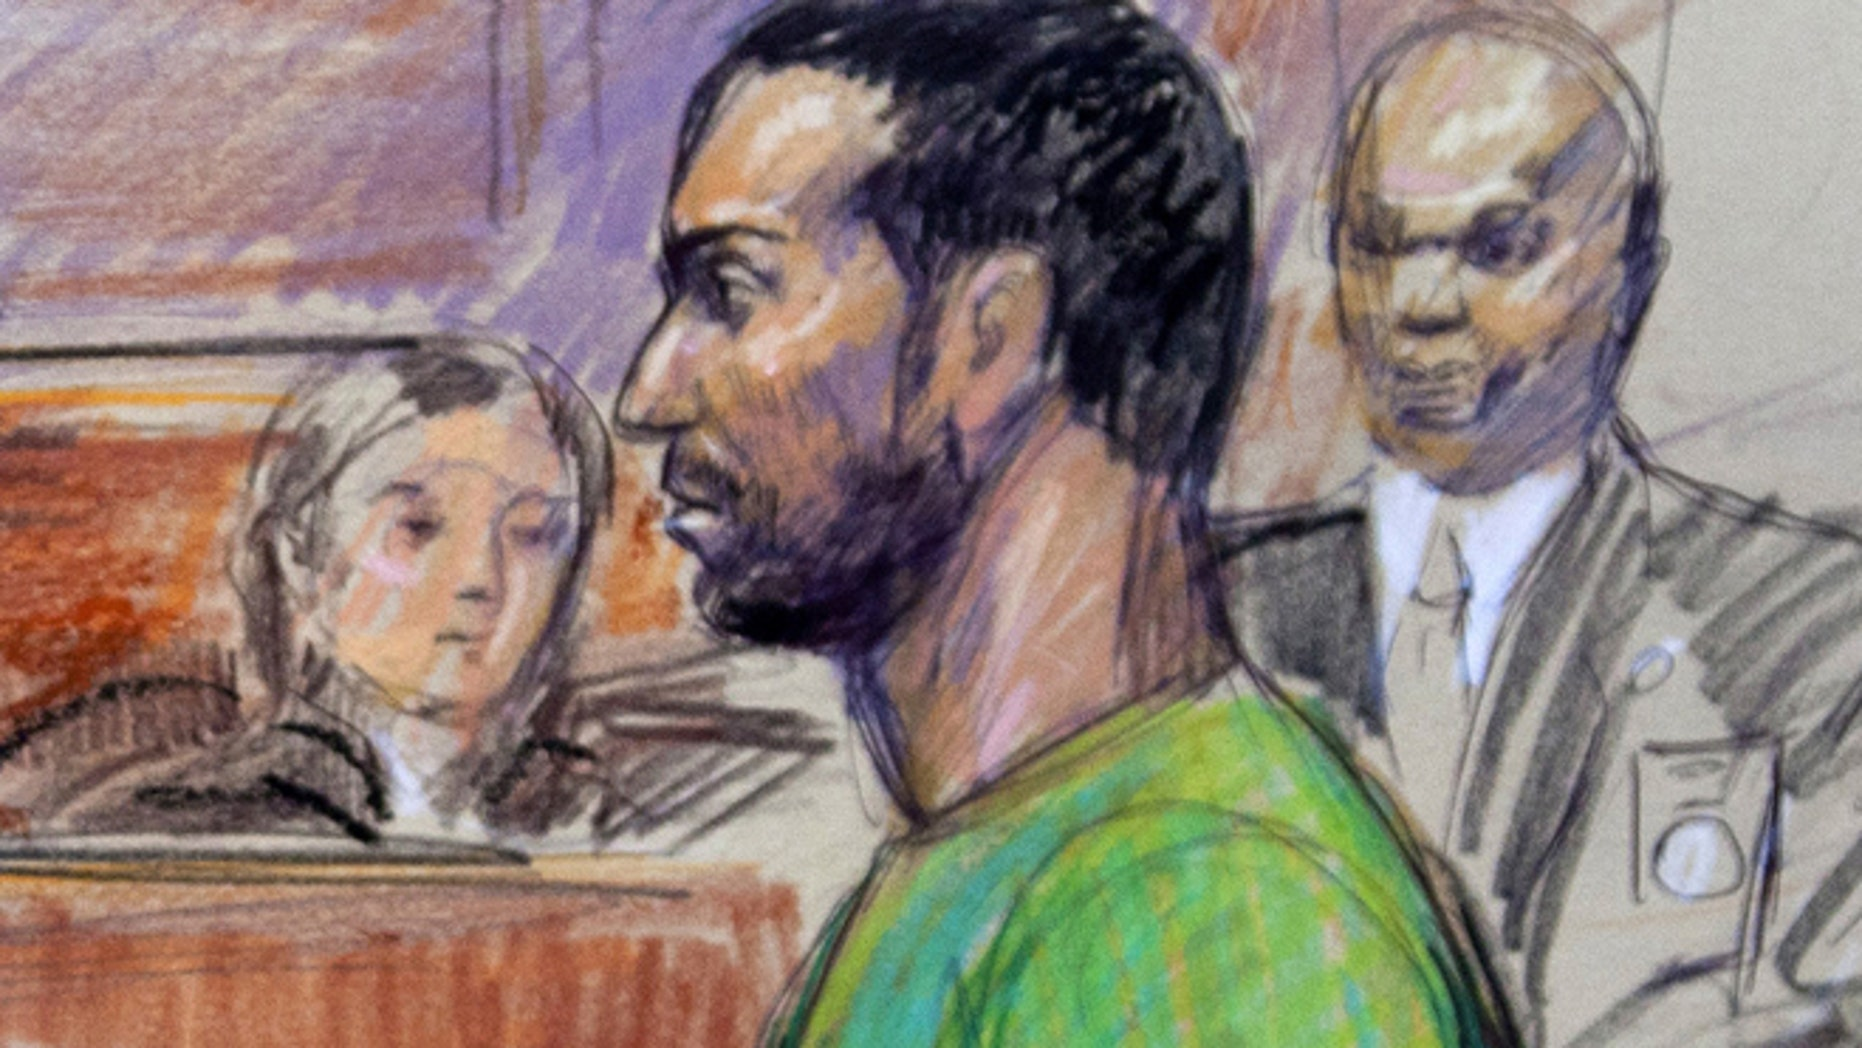 Feb. 17, 2012: Artist rendering shows Amine El Khalifi in federal court in Alexandria, Va.